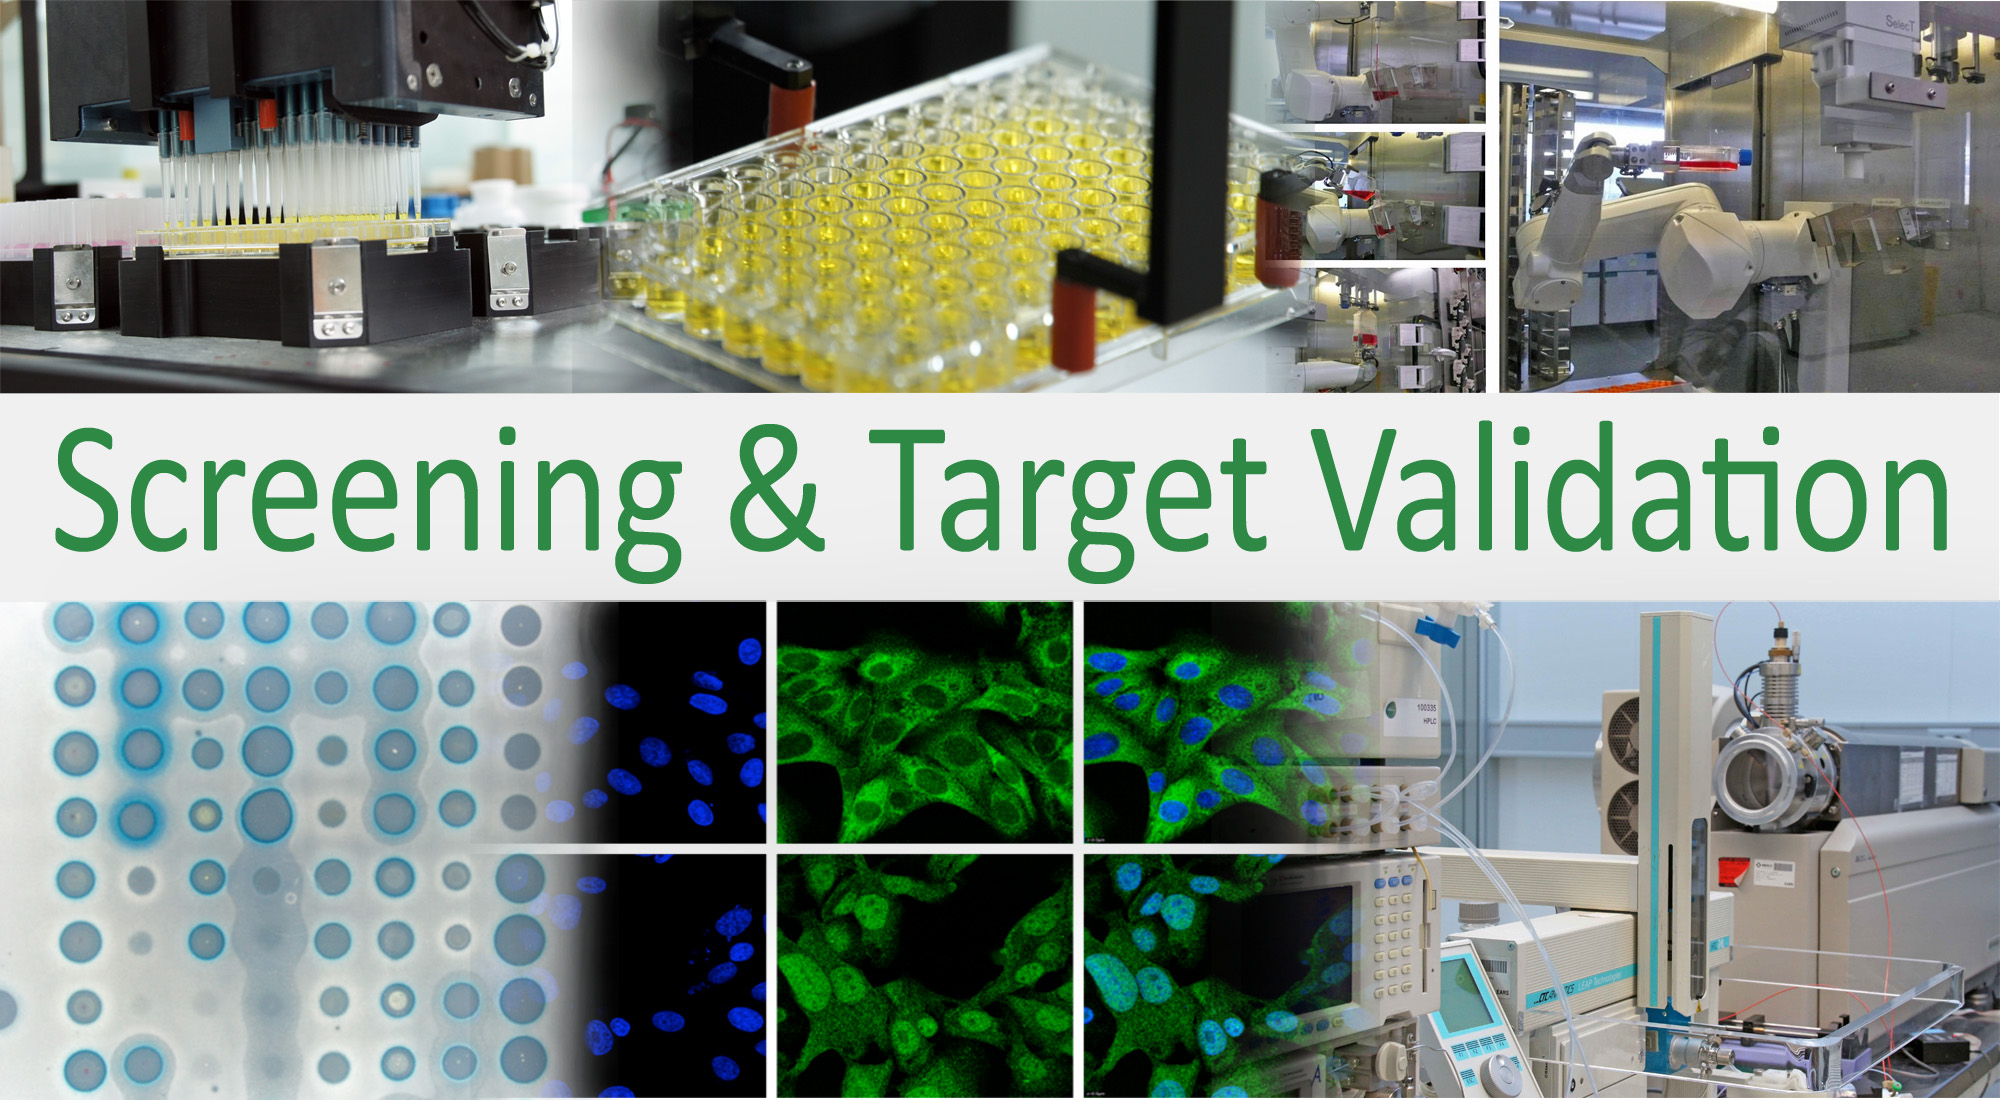 CoreScientificFacilitiesScreening